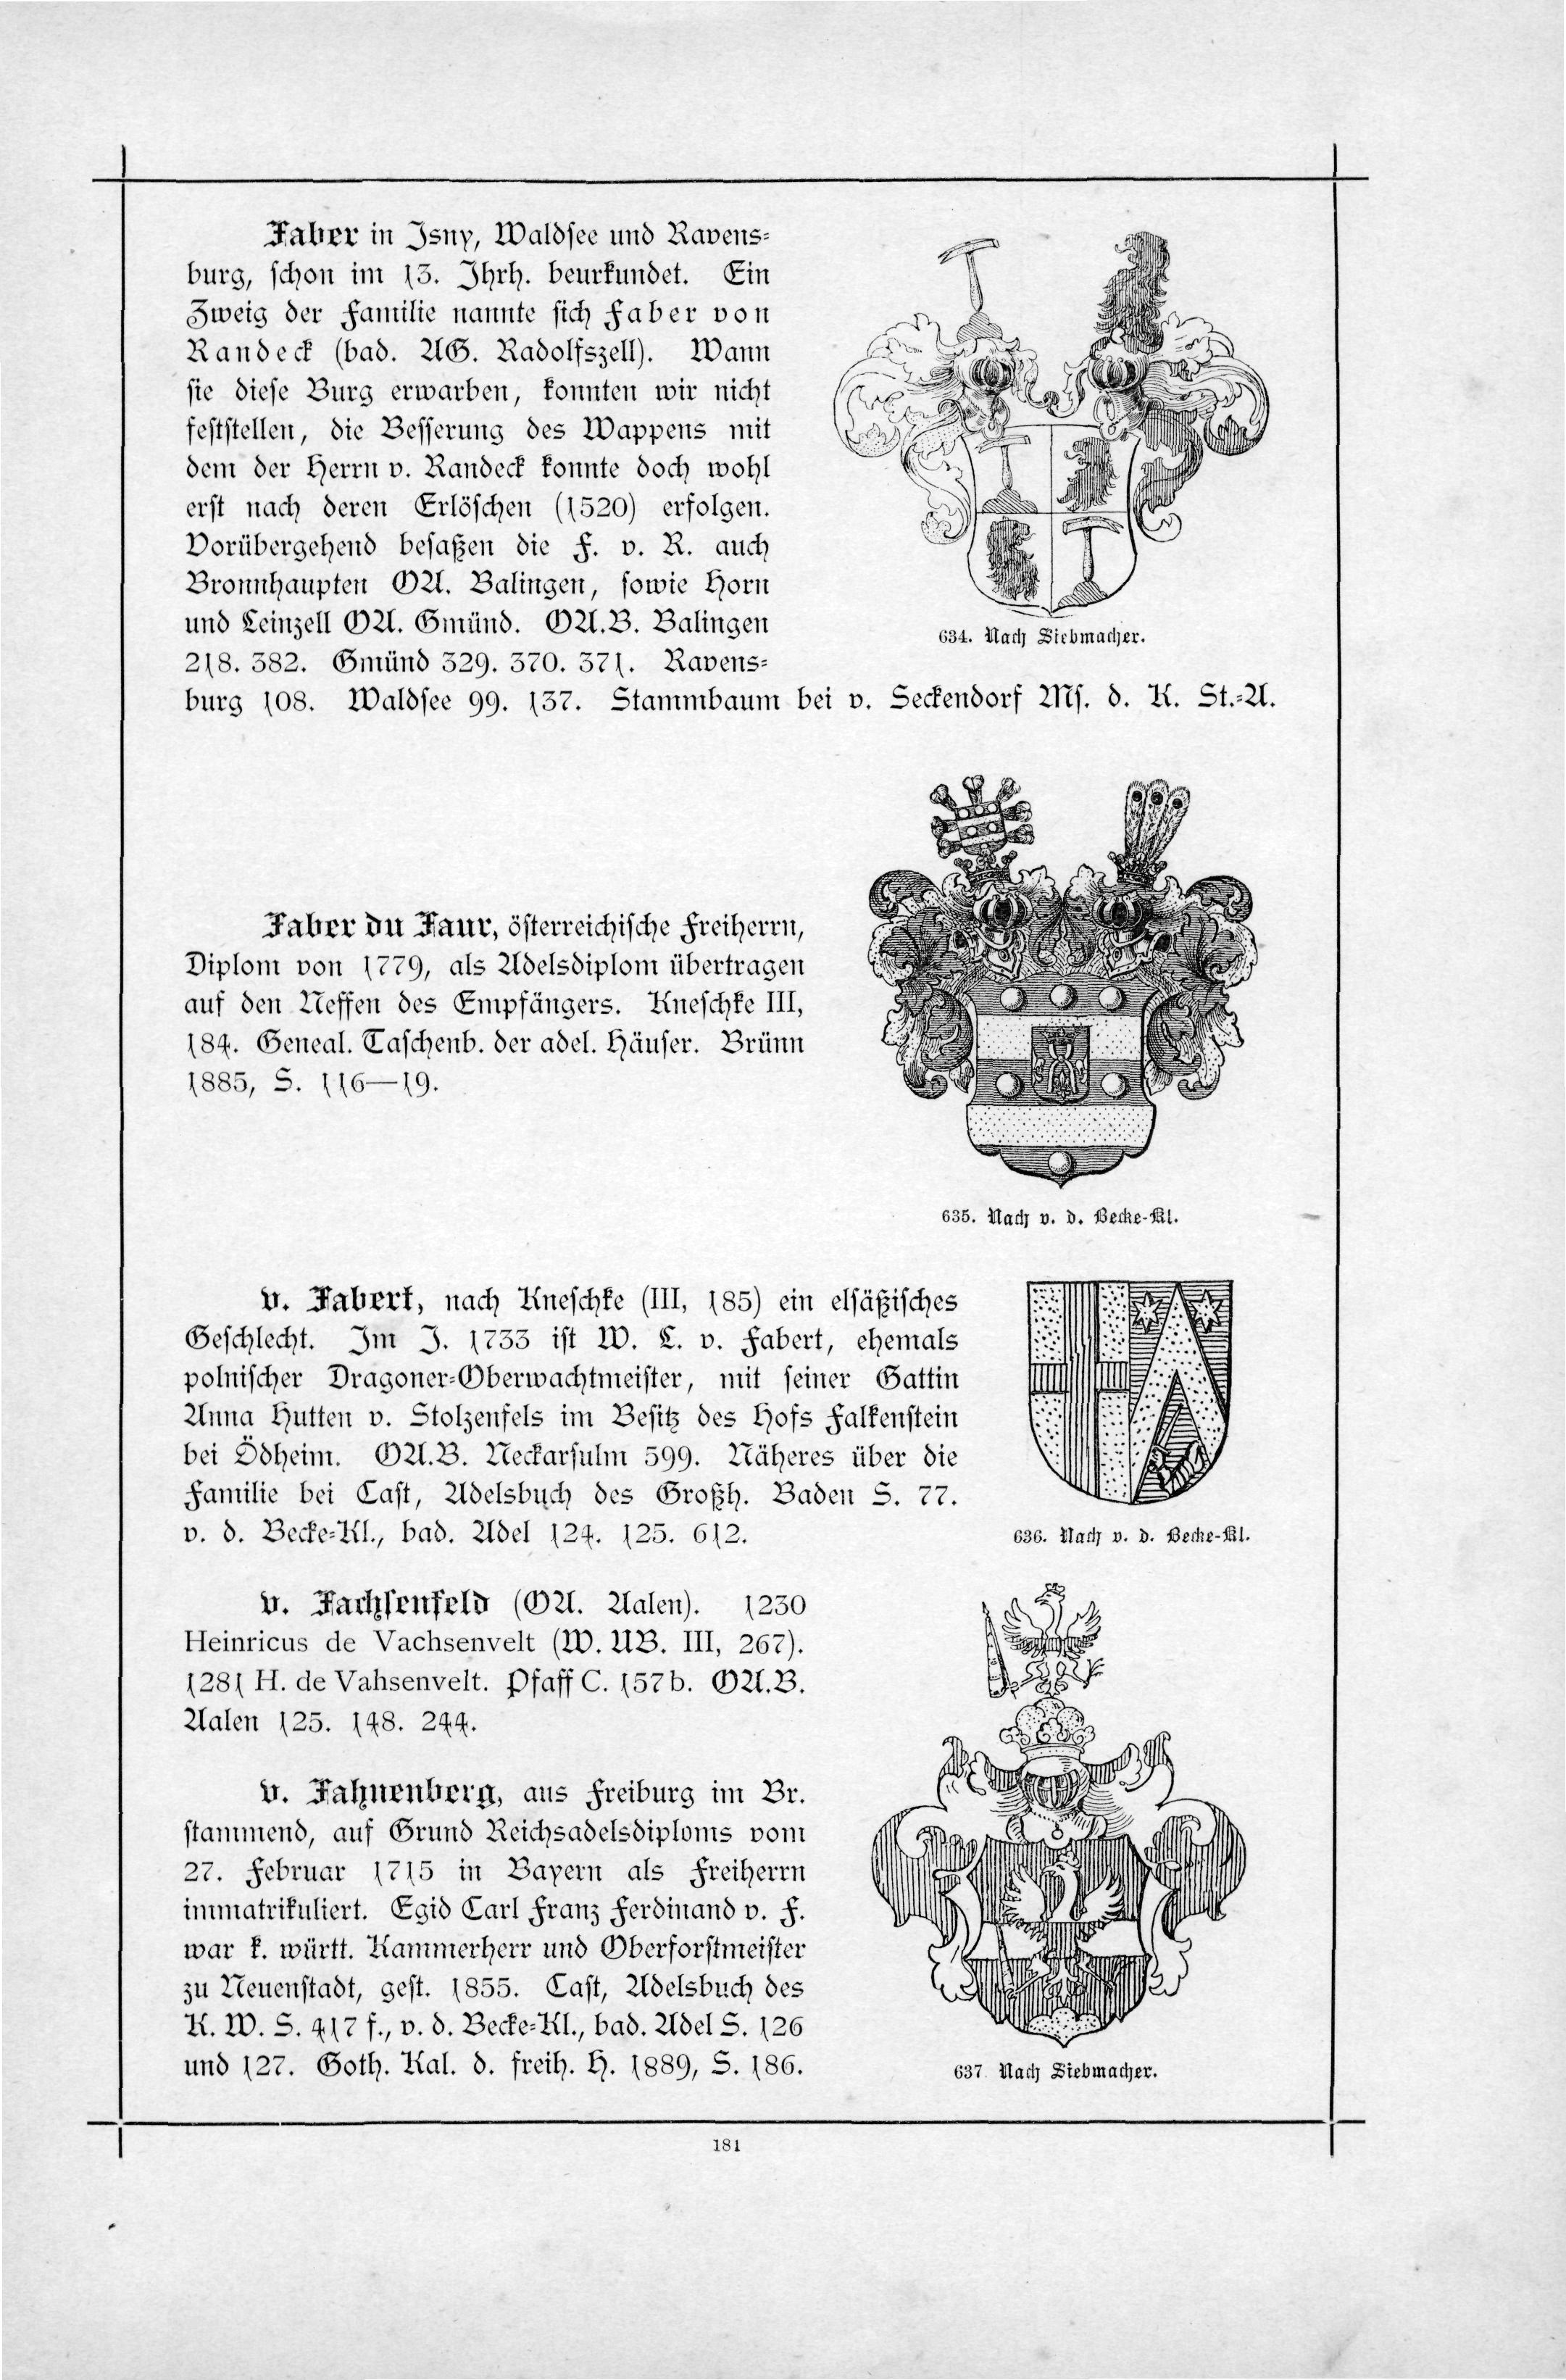 File:Alberti Wappenbuch H03 S 0181.jpg - Wikimedia Commons